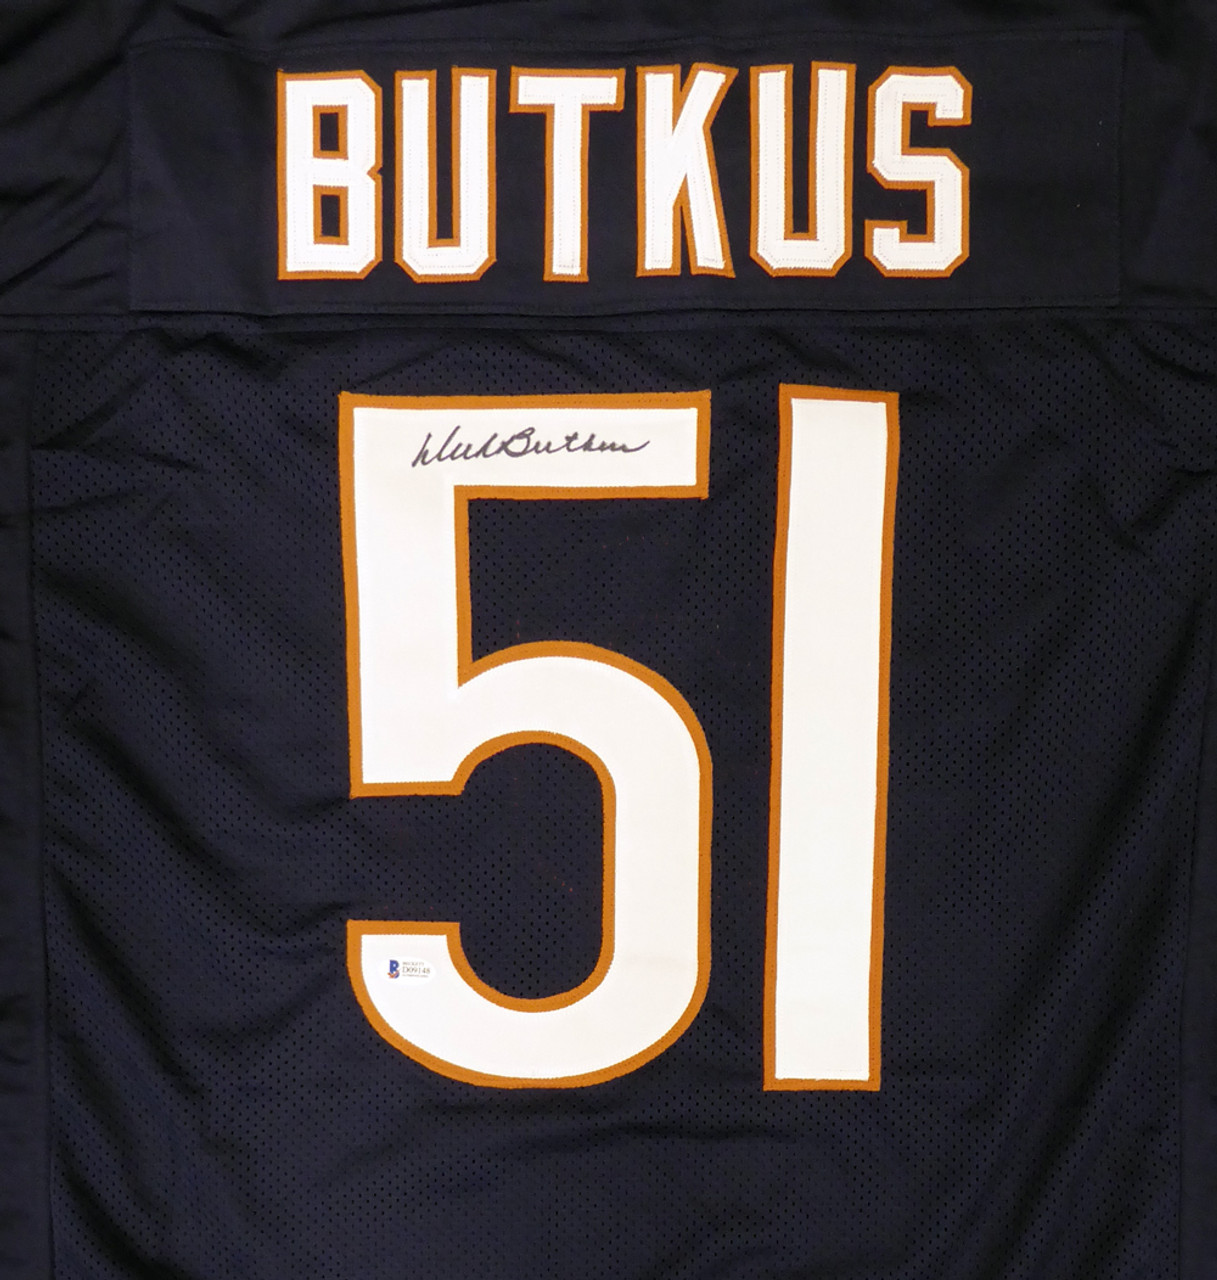 Dick Butkus Autographed Jersey - Chicago Bears Blue Custom Beckett BAS